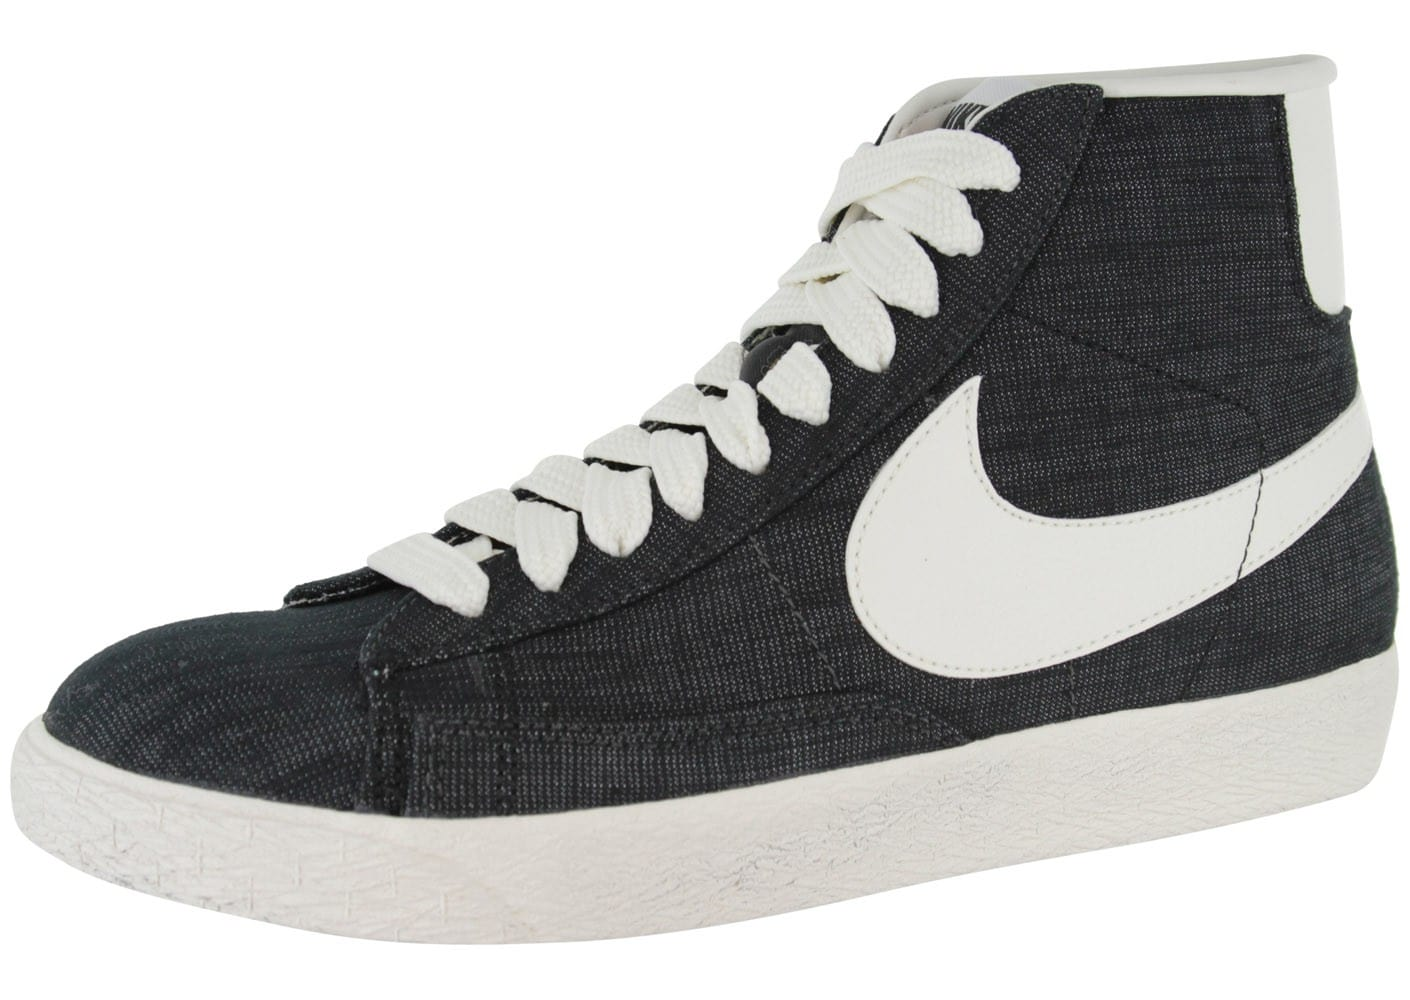 best sneakers 87455 c165c Acheter blazer chaussures pas cher